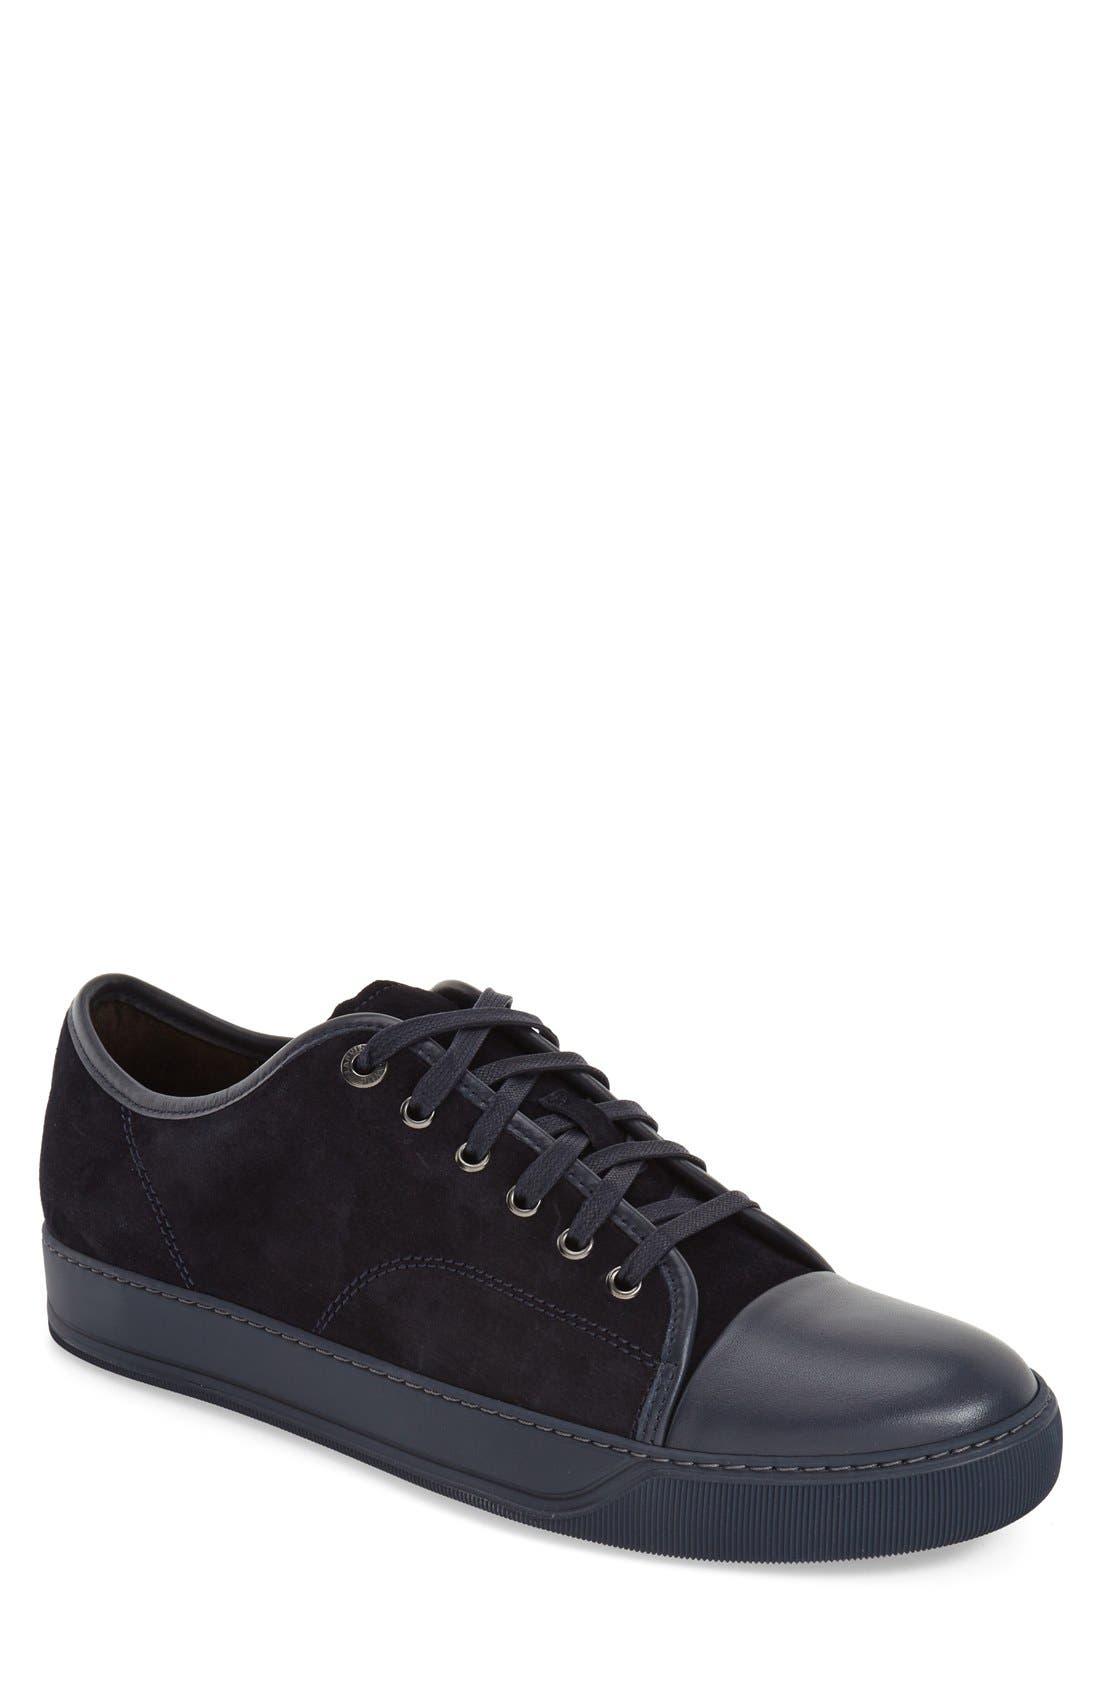 Lanvin Low Top Sneaker (Men)